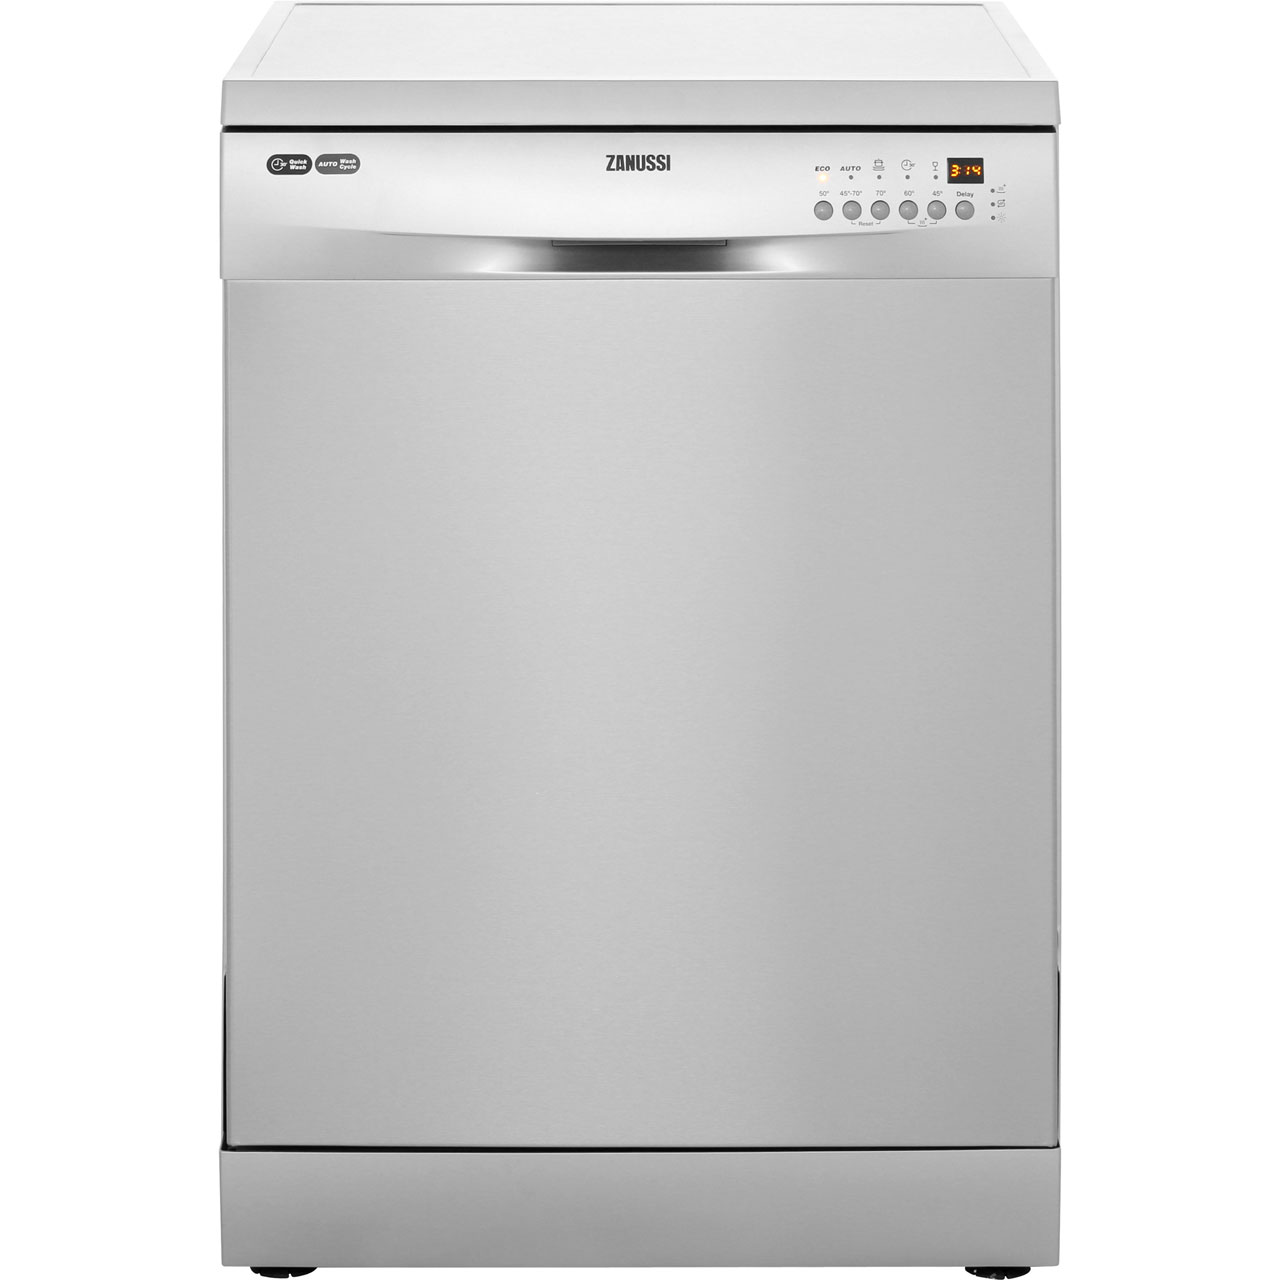 buy cheap zanussi dishwasher compare dishwashers prices. Black Bedroom Furniture Sets. Home Design Ideas